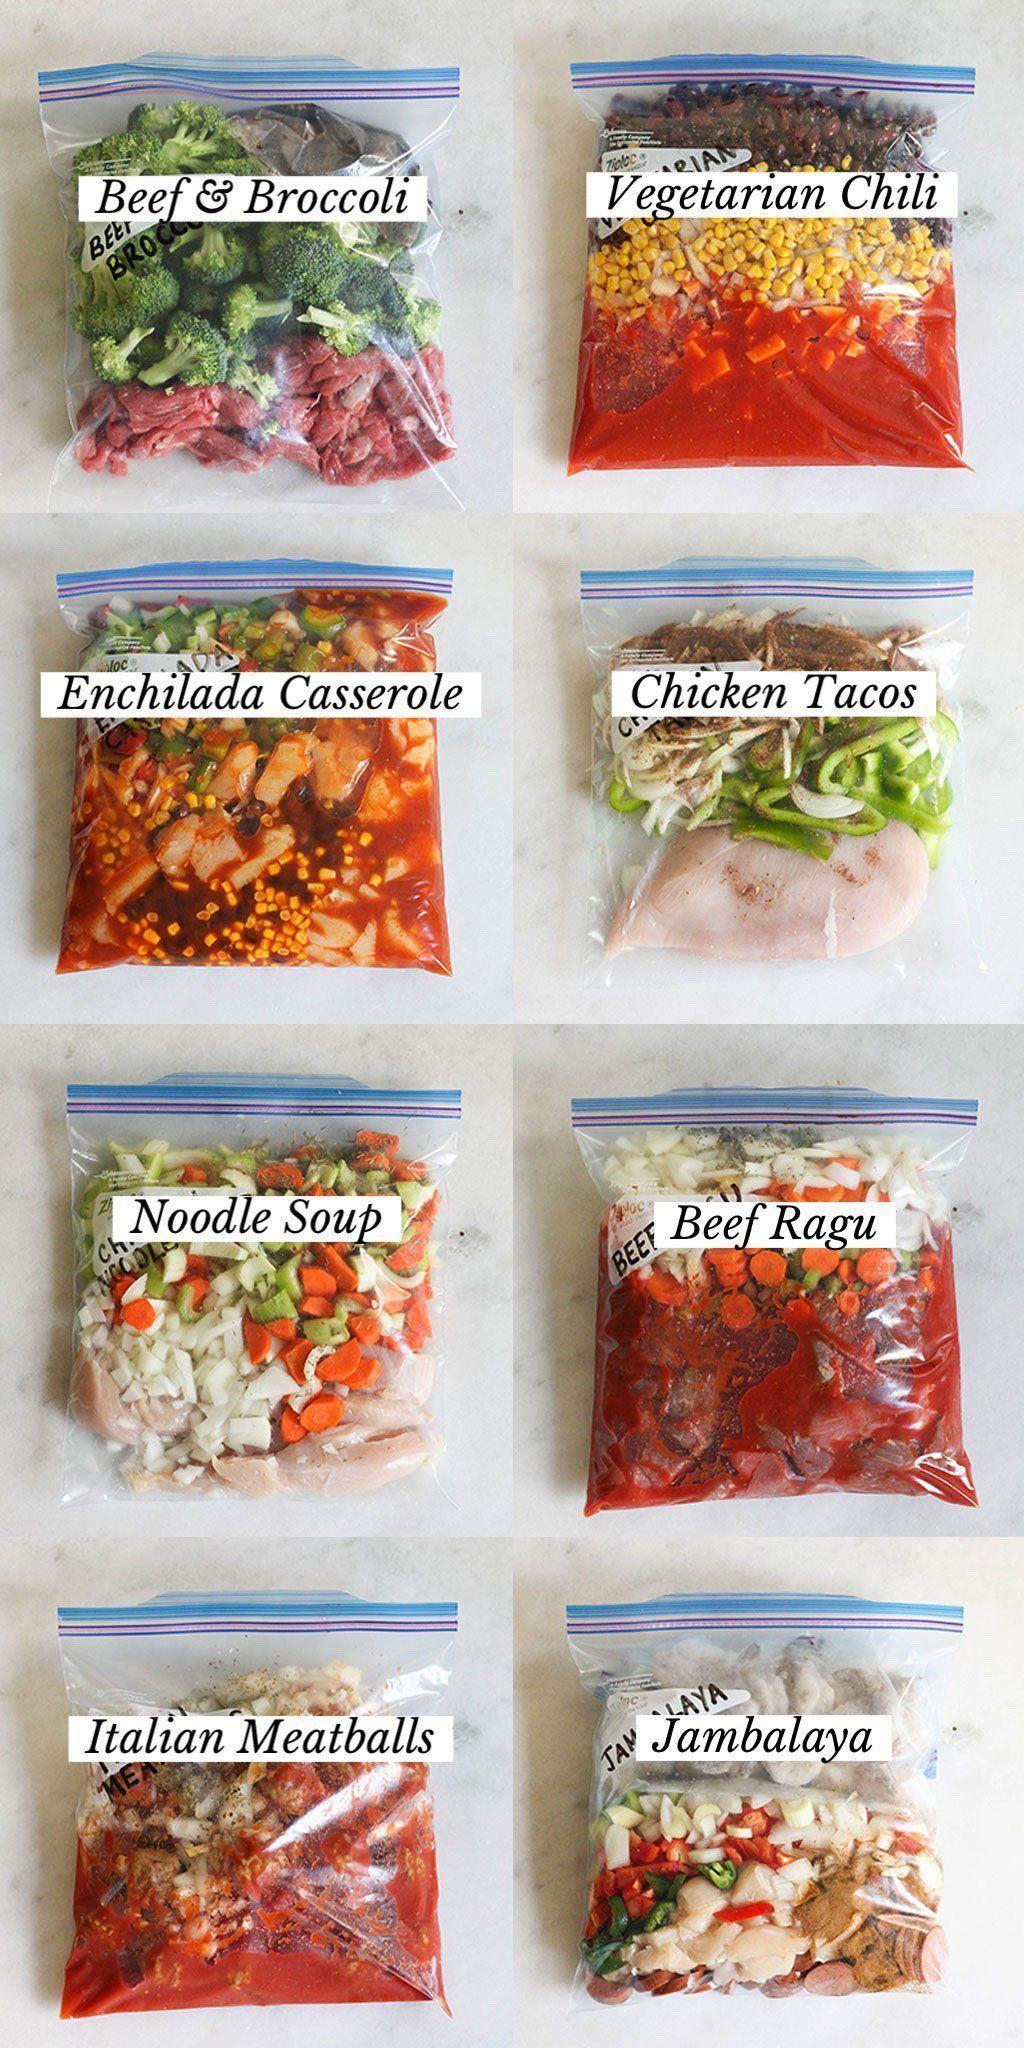 8 Extremely Easy Crock-Pot Freezer Meals: Just Dump-and-Go! #crockpotmealprep